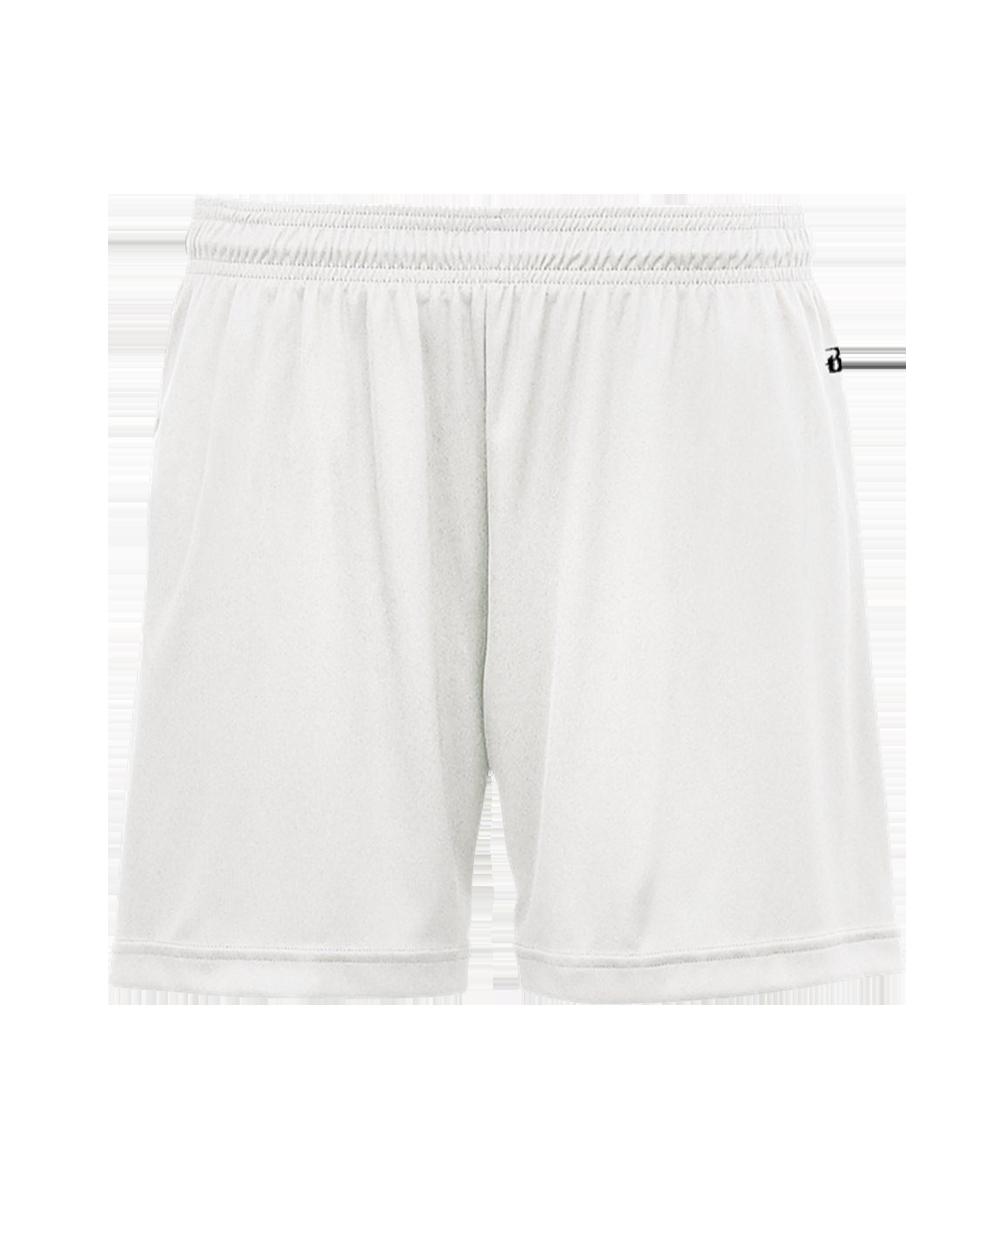 B-Core Women's Short - White